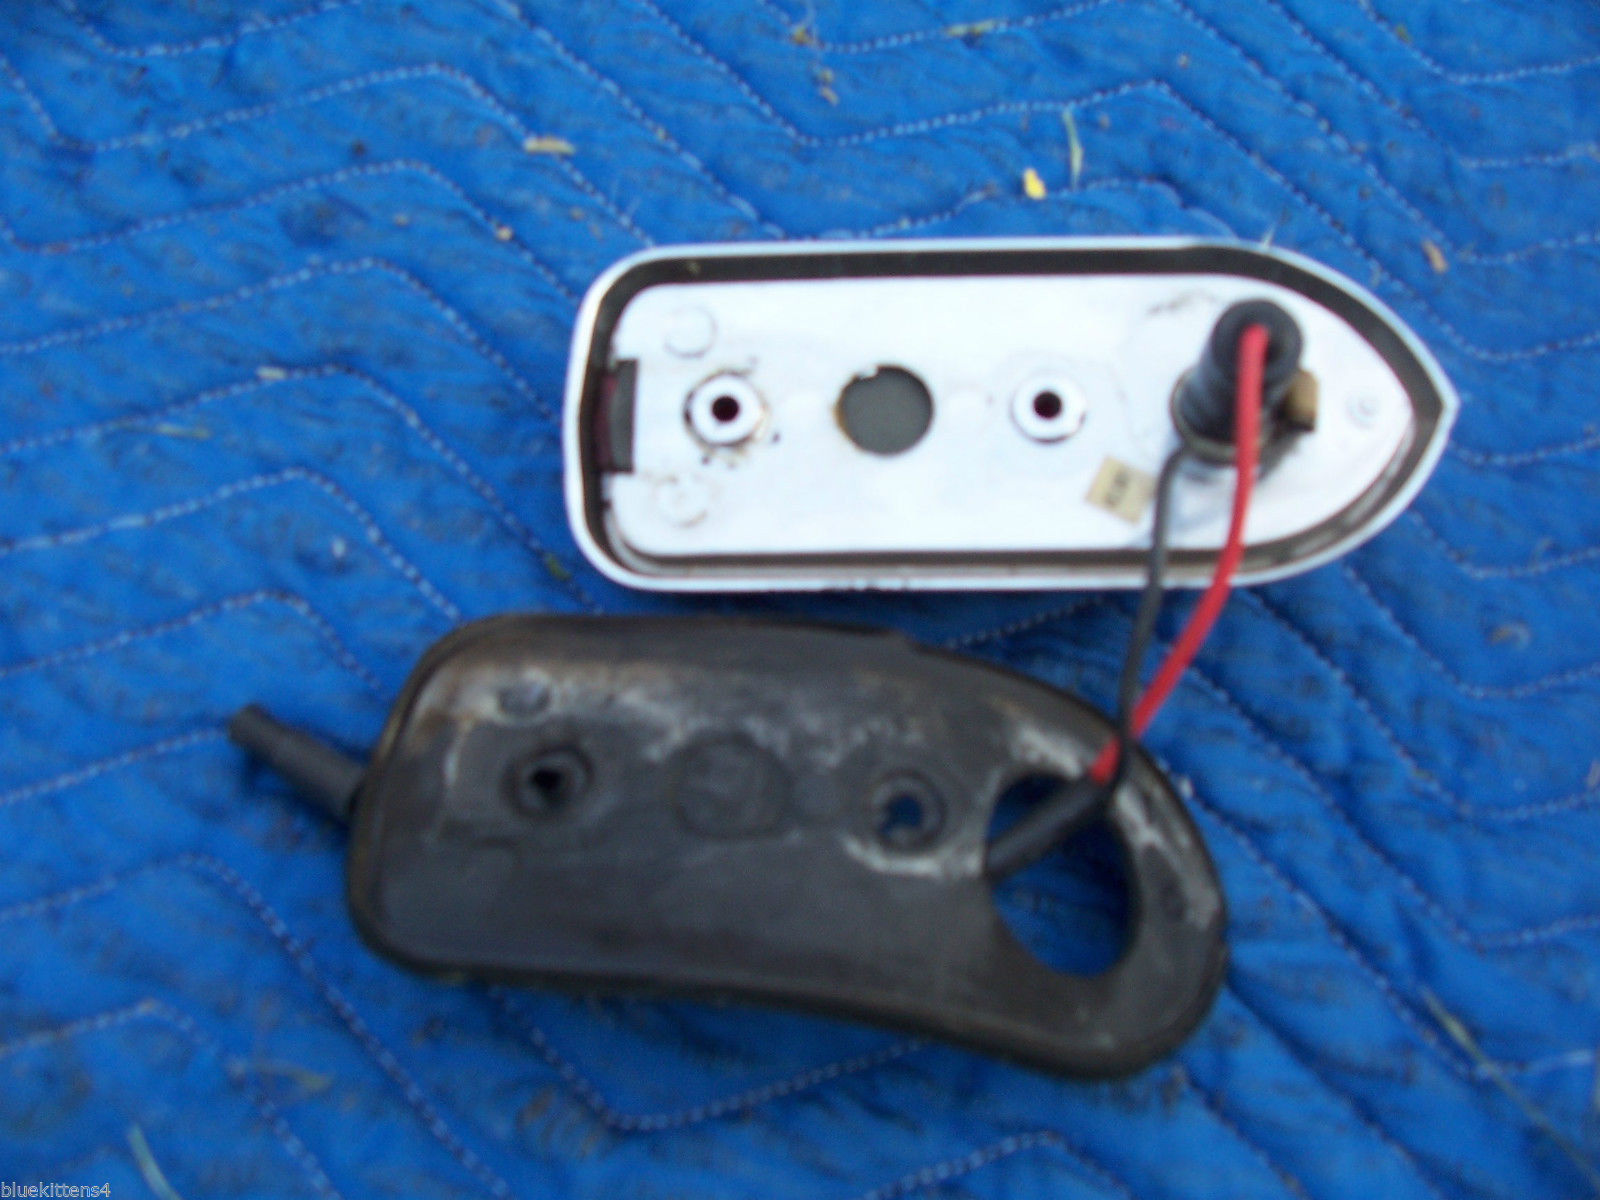 1982 JAGUAR XJ 6 RIGHT SIDE REAR MARKER CLEARANCE LIGHT OEM USED ORIG 1980 1981